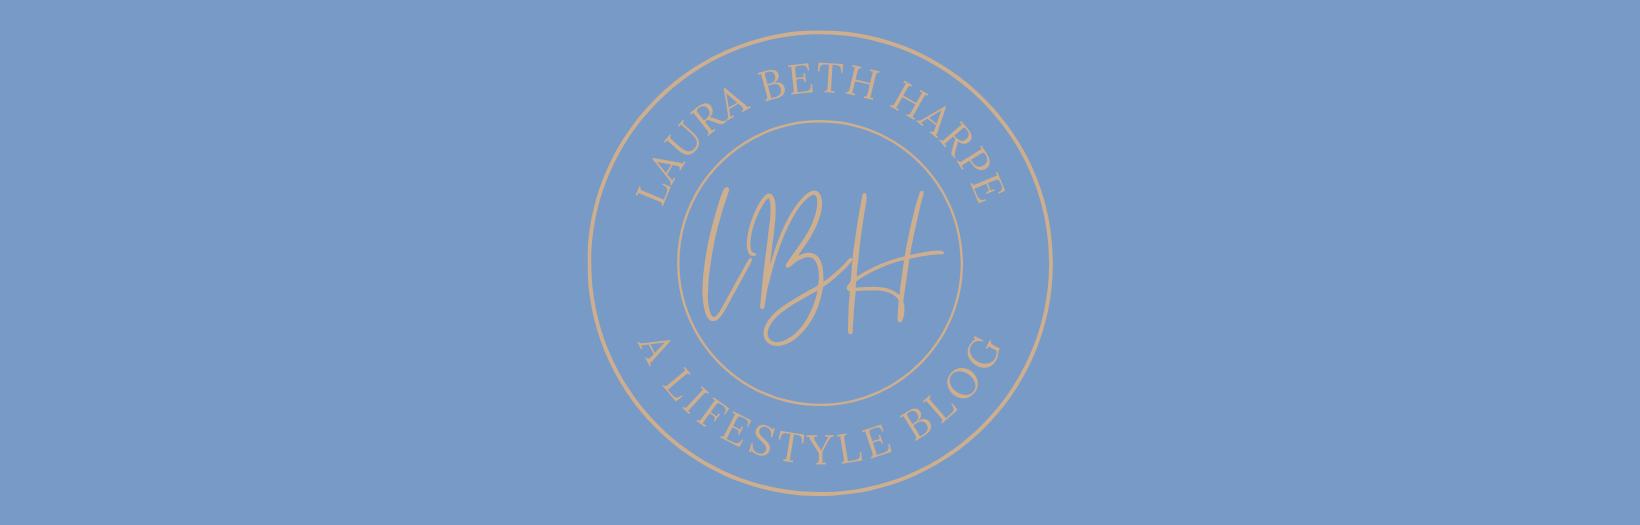 Laura Beth Harpe